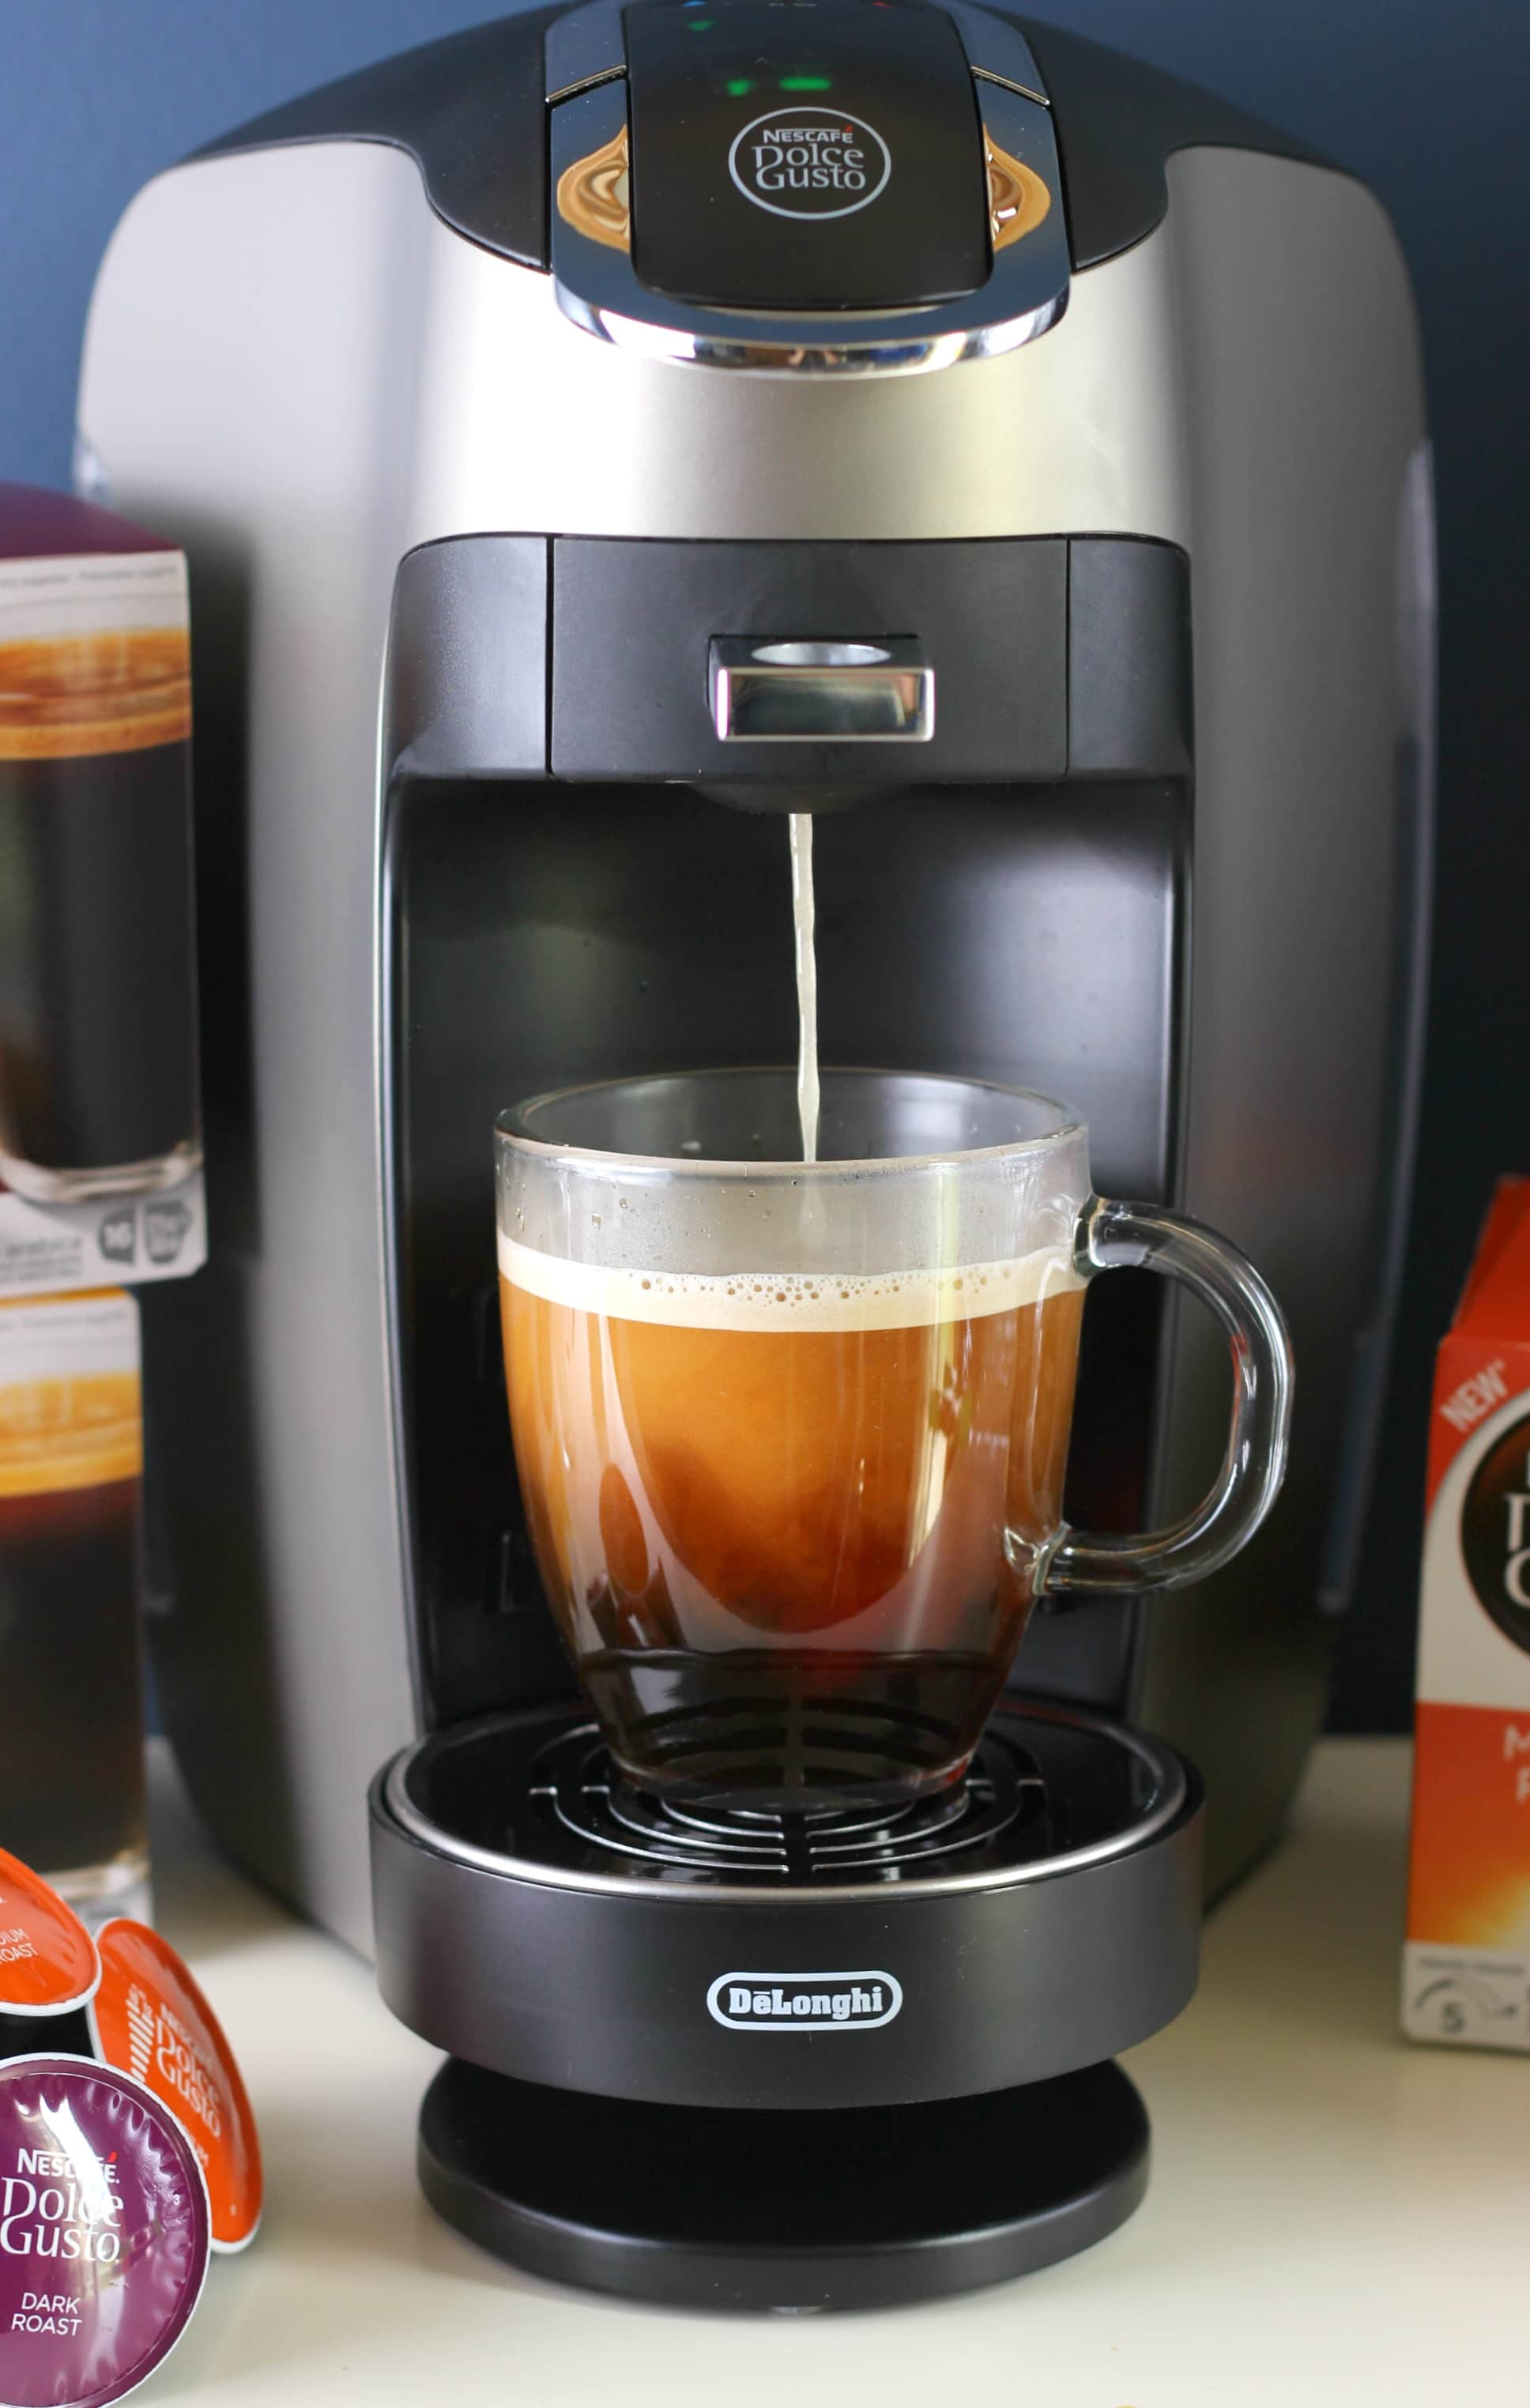 Mug of NESCAFÉ Dolce Gusto Coffee